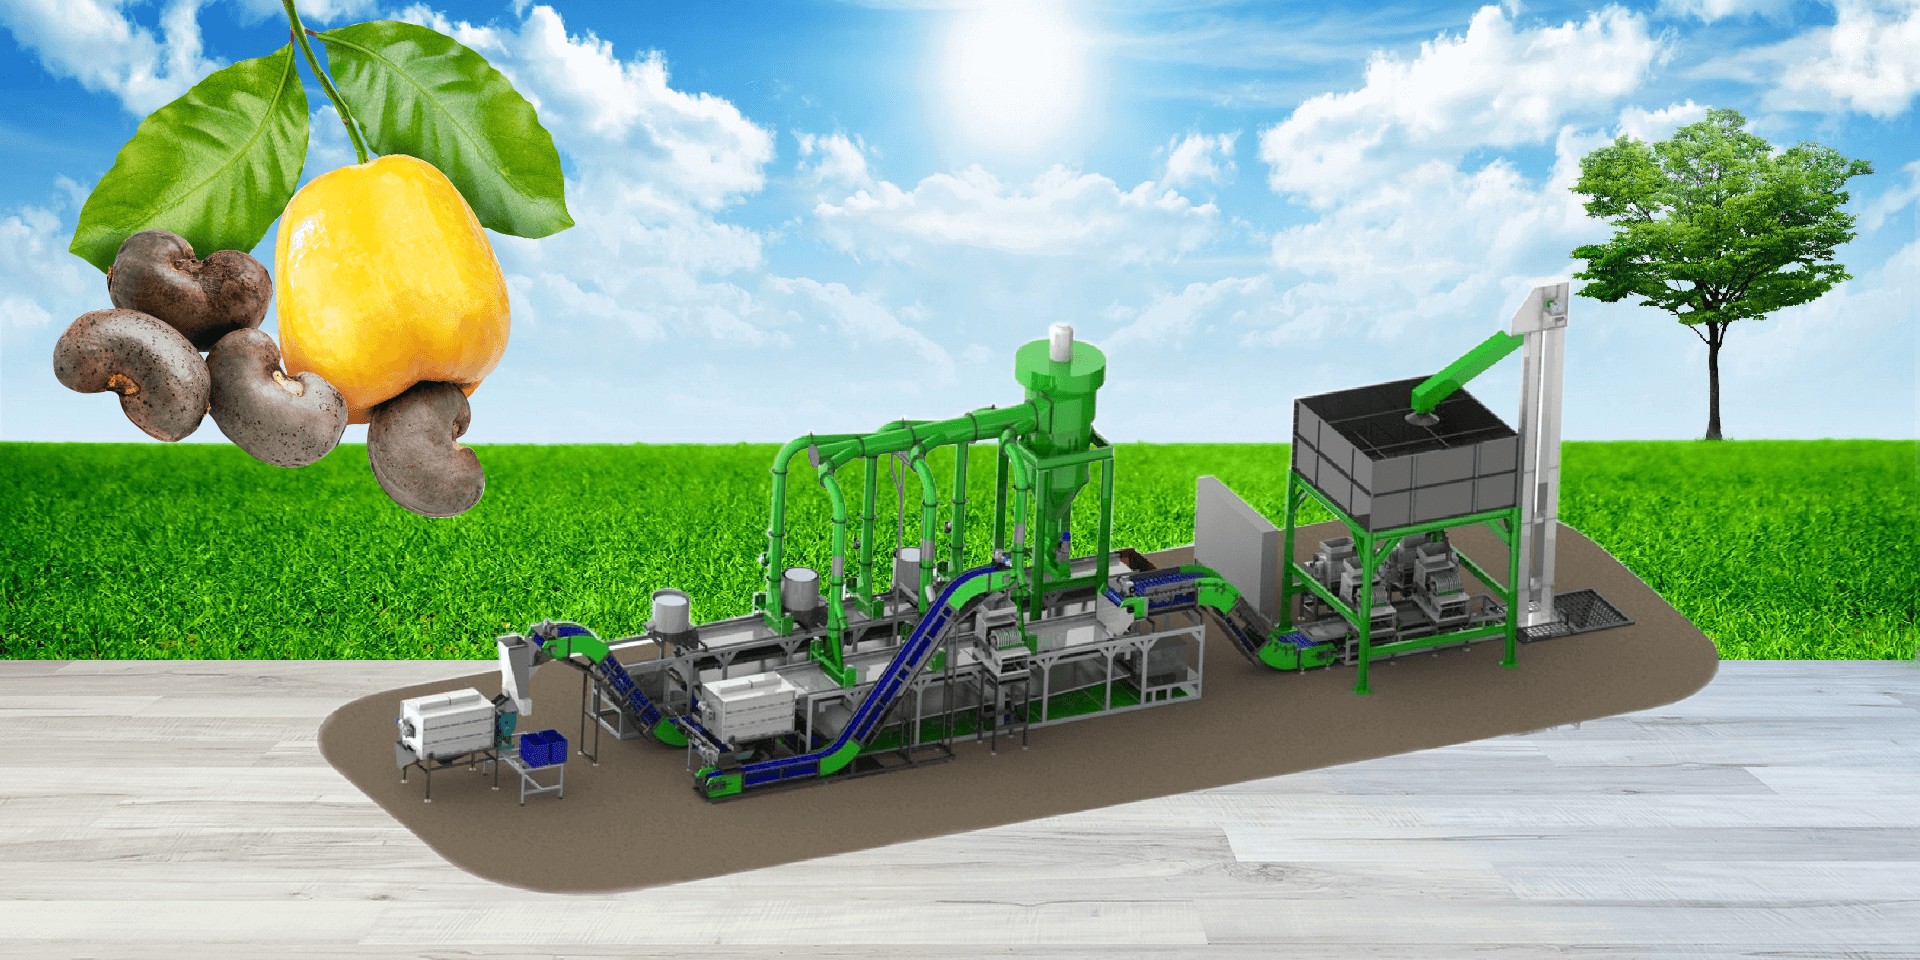 GI AGRO TECHNOLOGIES PVT LTD